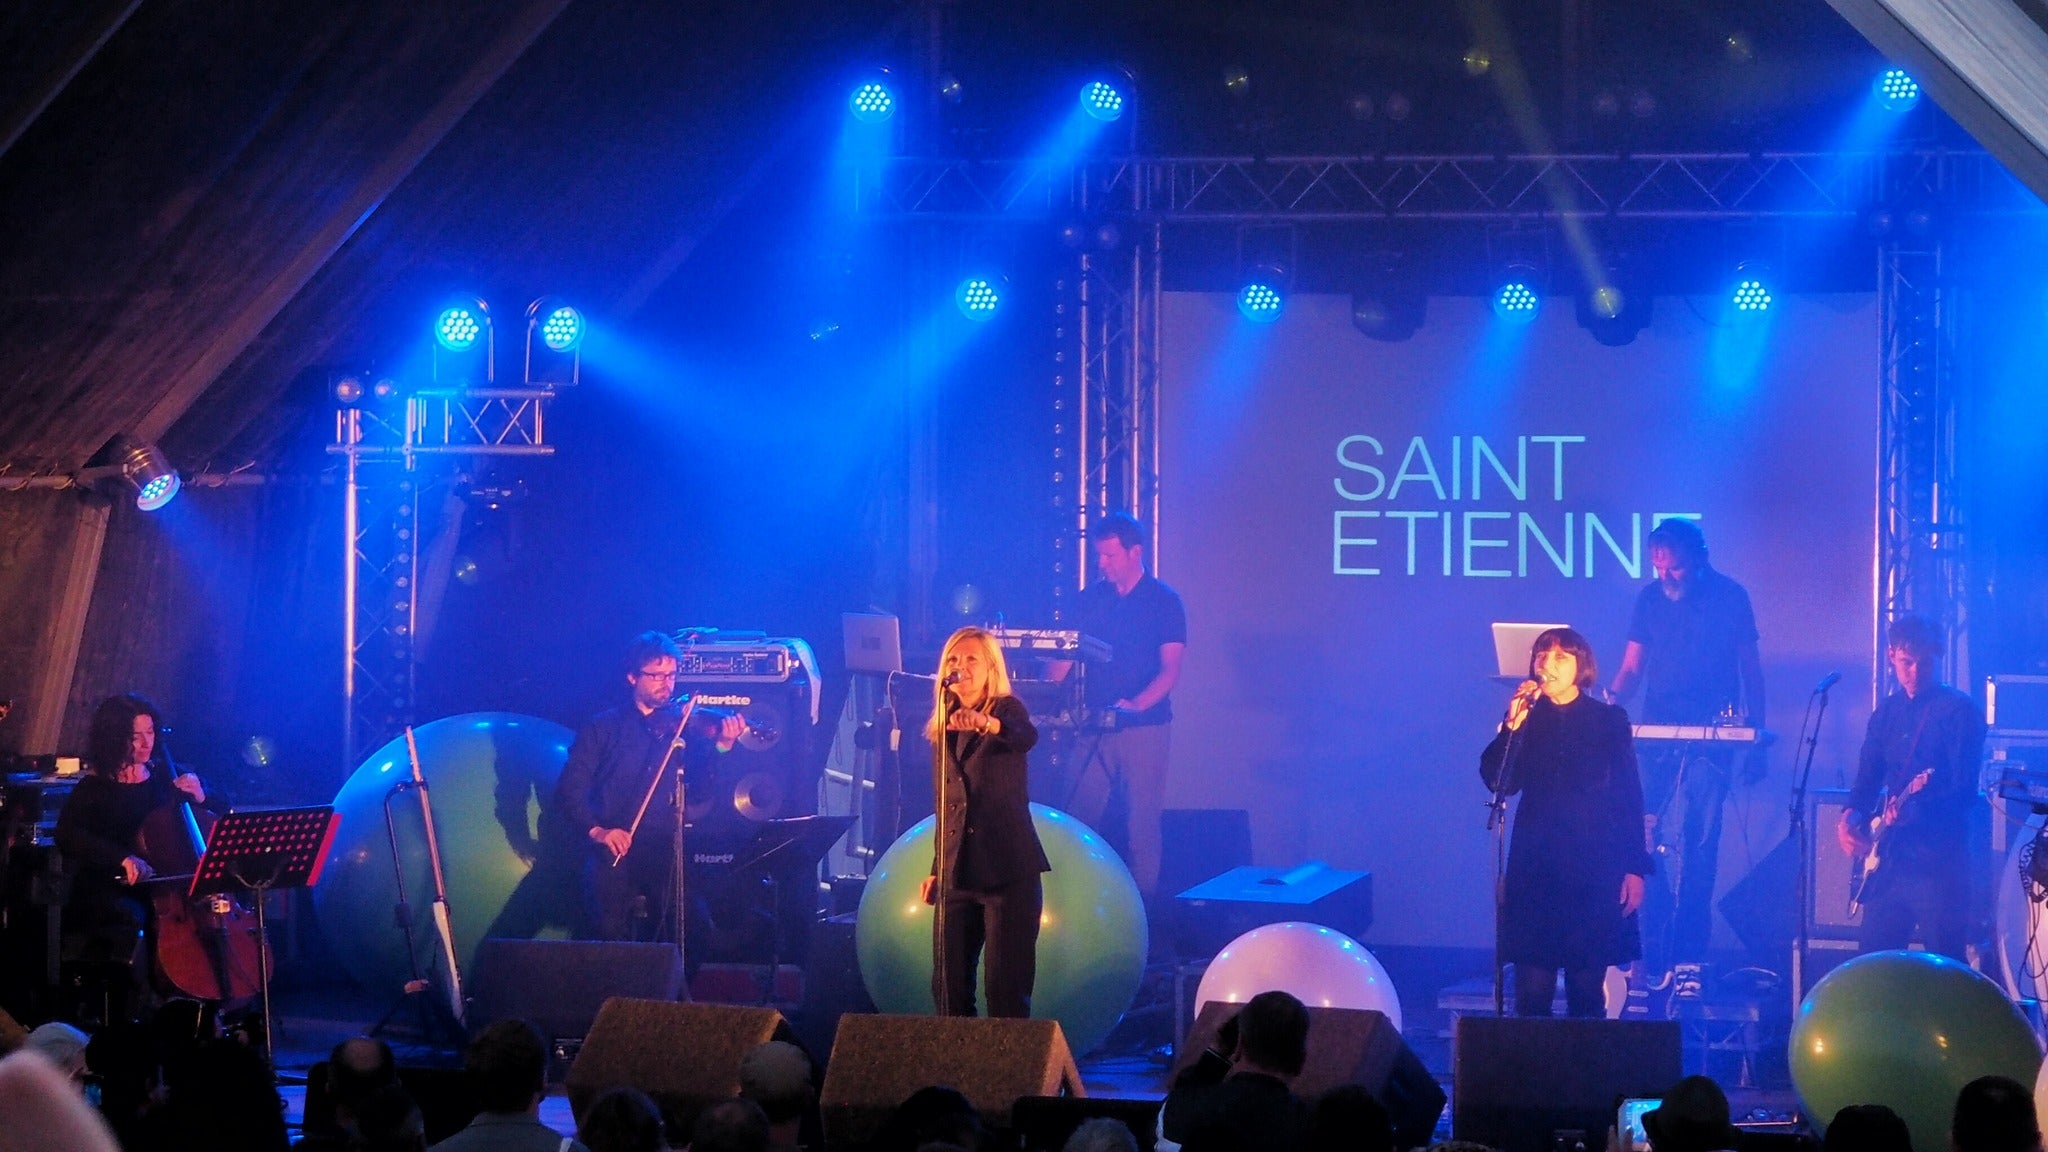 Saint Etienne at The Fillmore - San Francisco, CA 94115